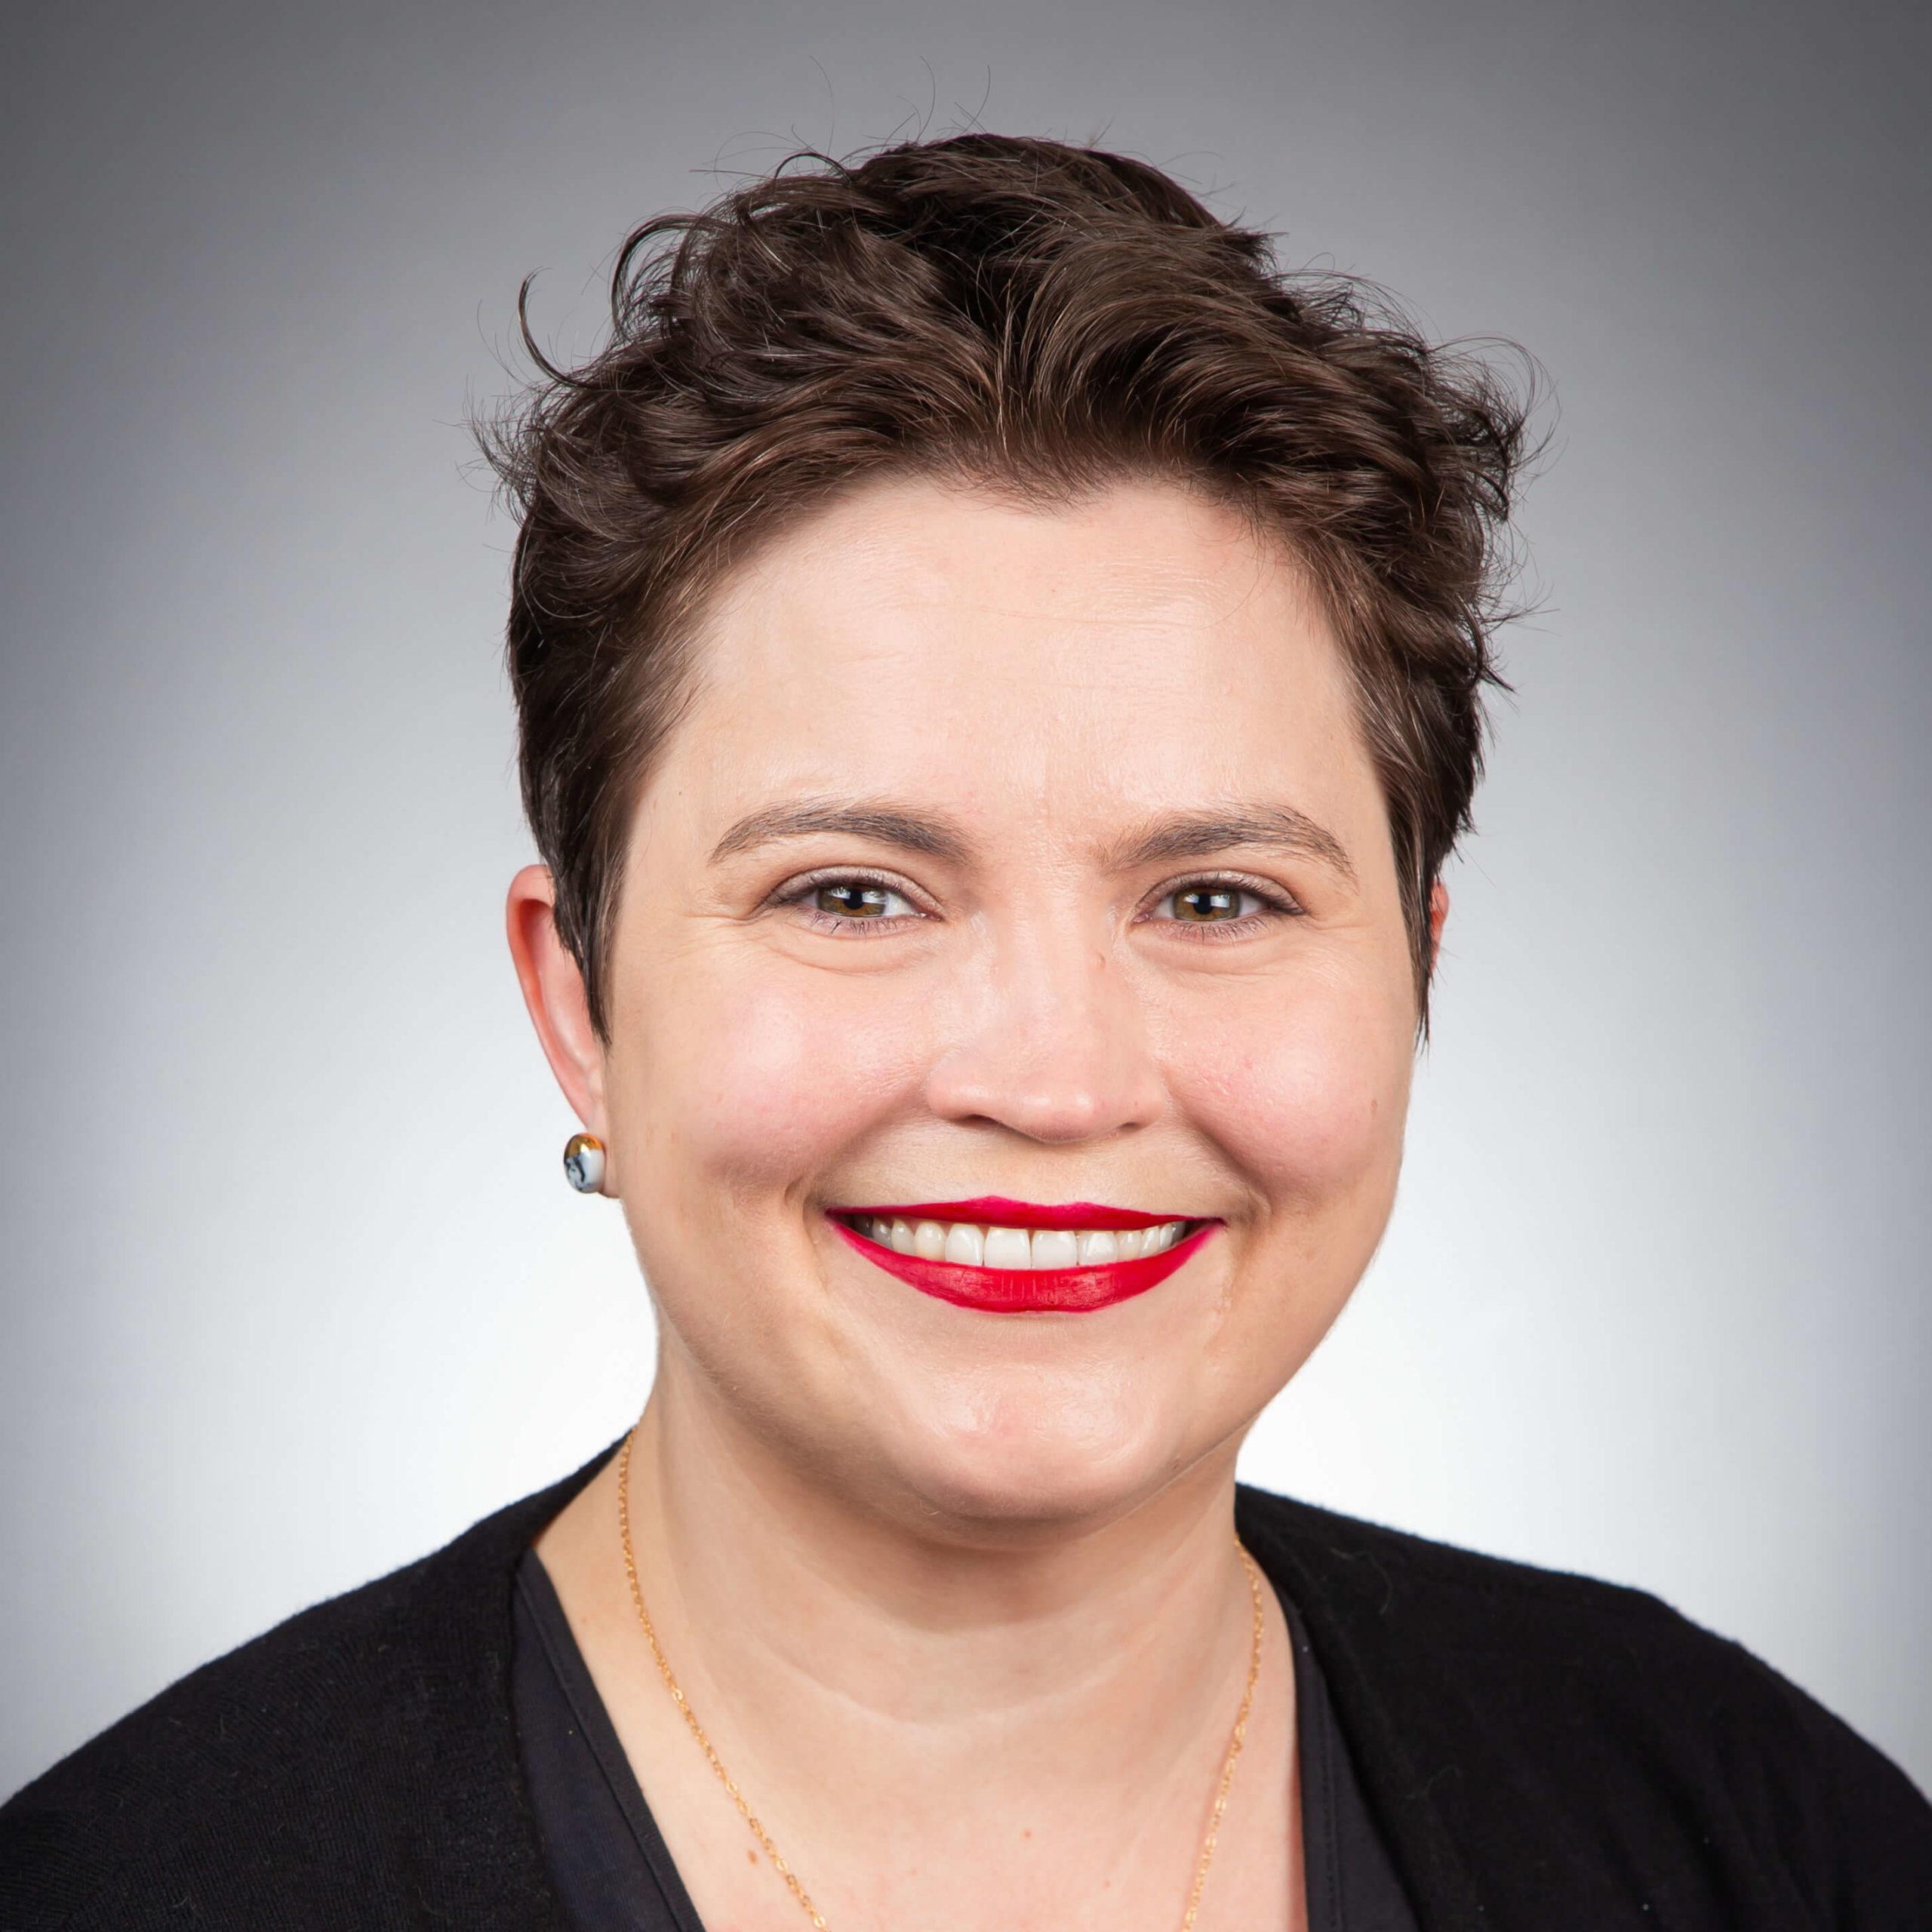 Anette Adamska